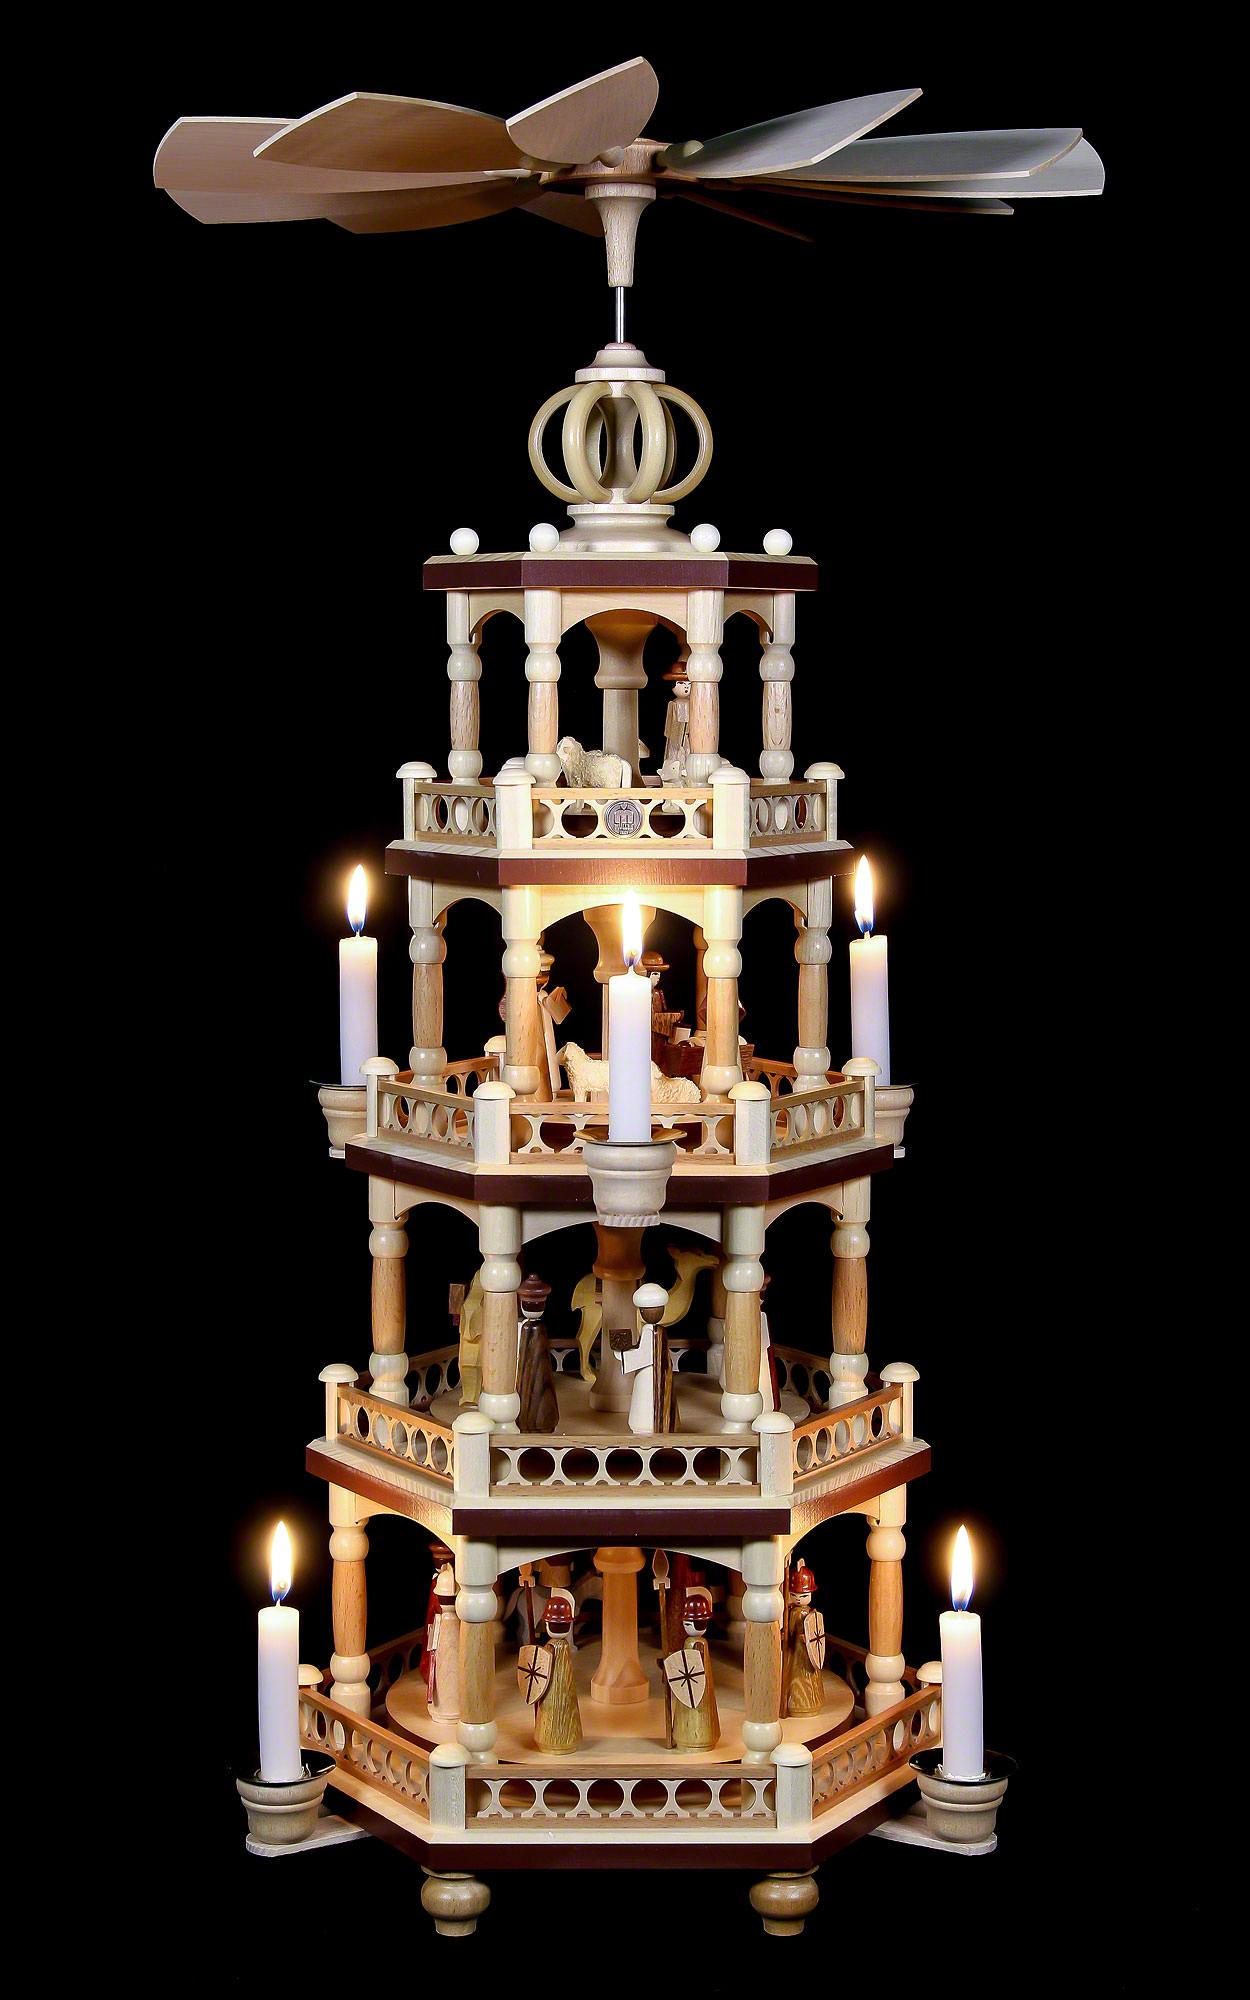 4 st ckige weihnachtspyramide heilige geschichte 64 cm. Black Bedroom Furniture Sets. Home Design Ideas